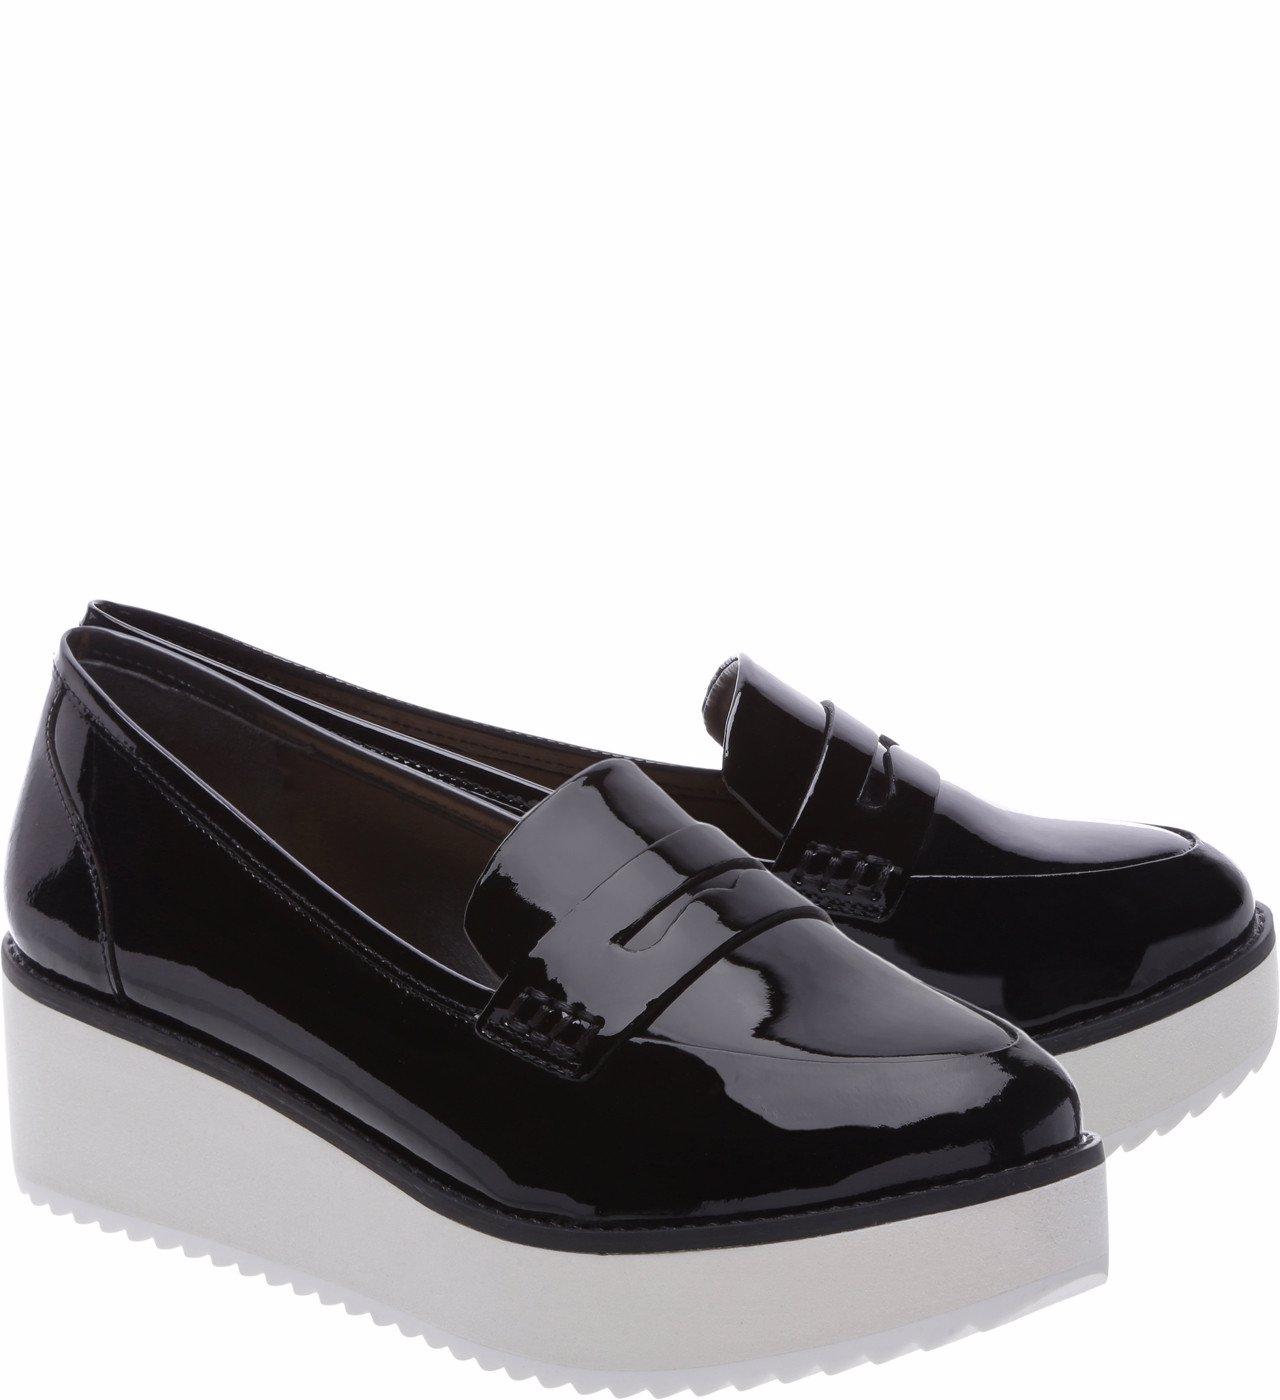 7b8c1eb78 NZSALE | Schutz Bevida Black Box Leather Flatform Platform Loafer Oxford